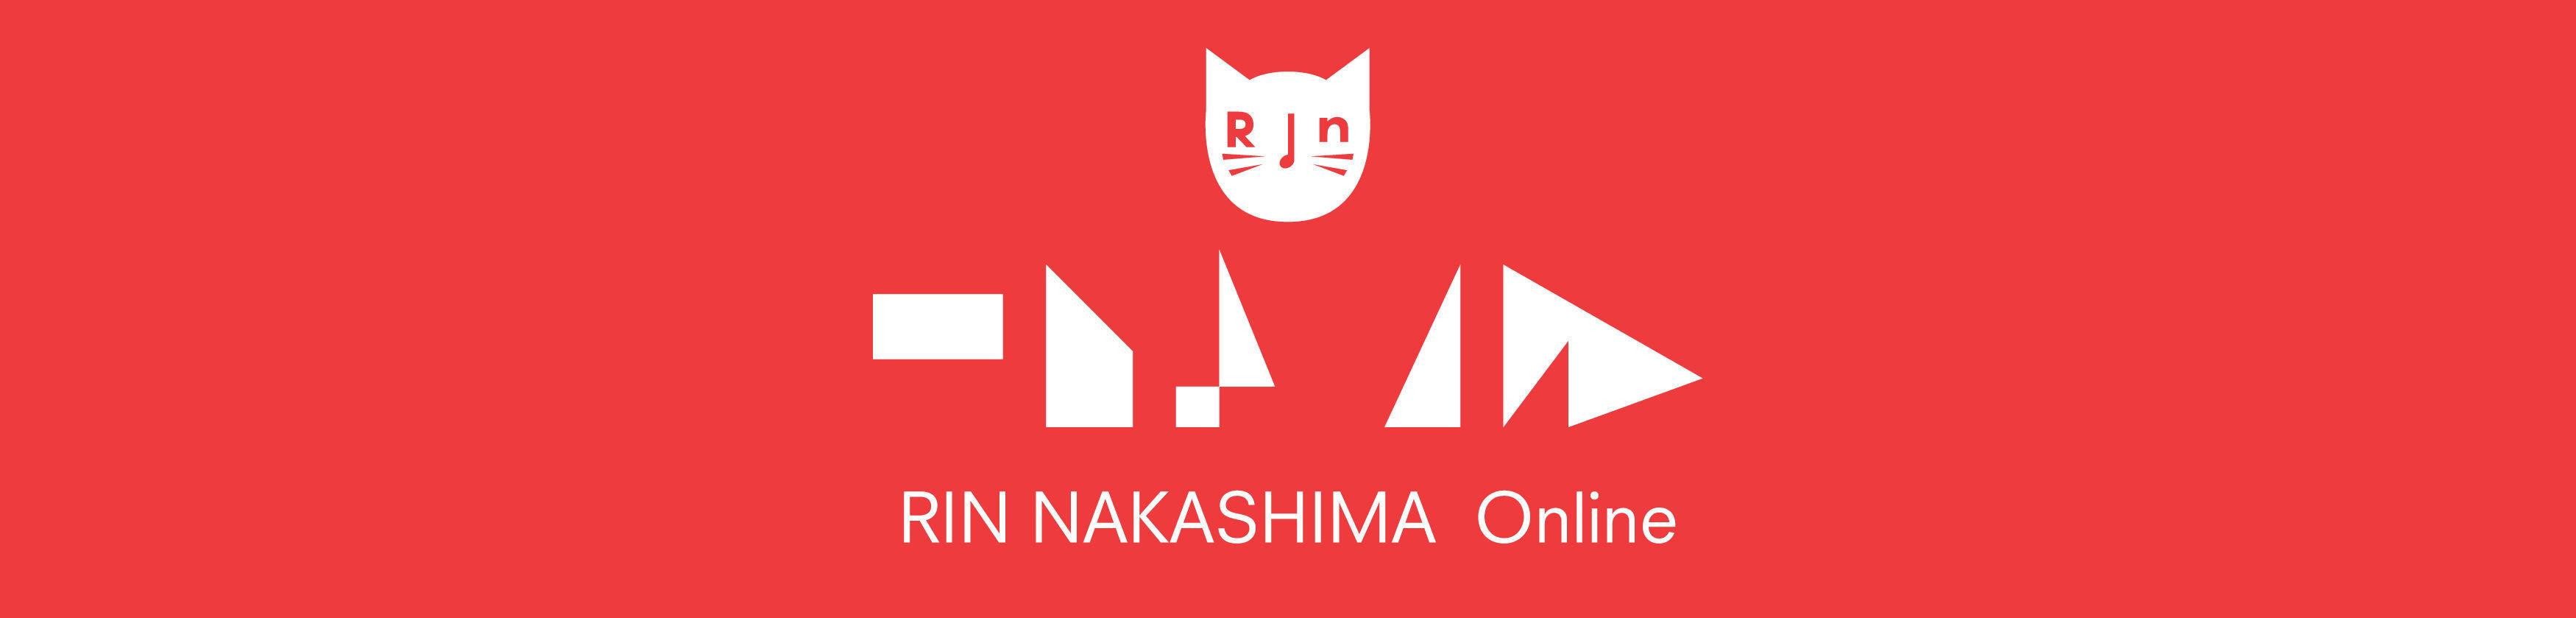 RIN NAKSHIMA Online